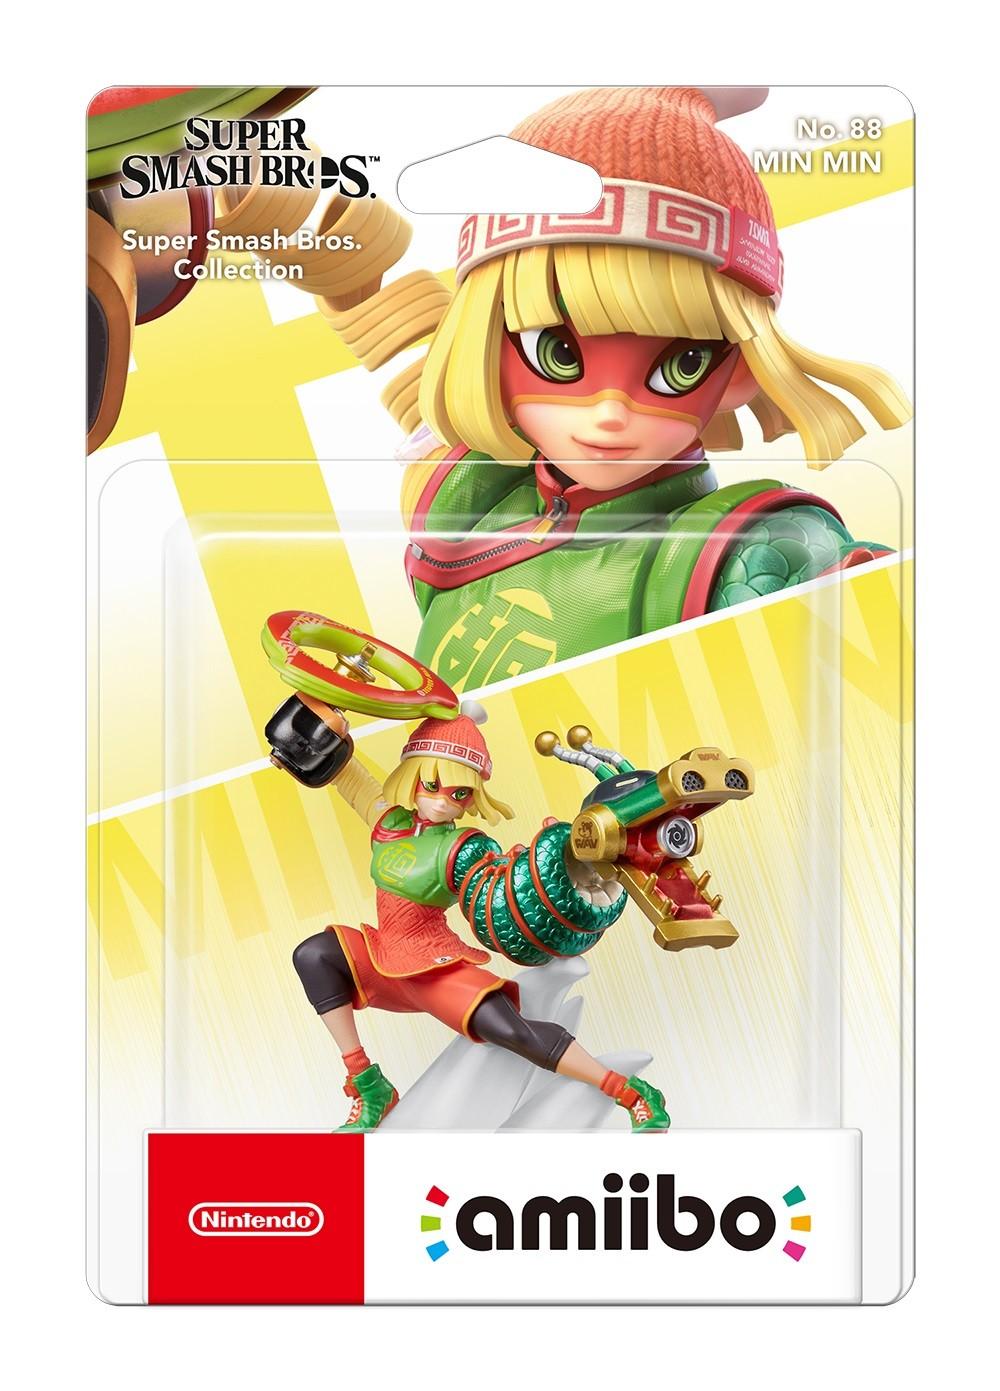 《ARMS》拉面美少女面面Amiibo将于2022年推出